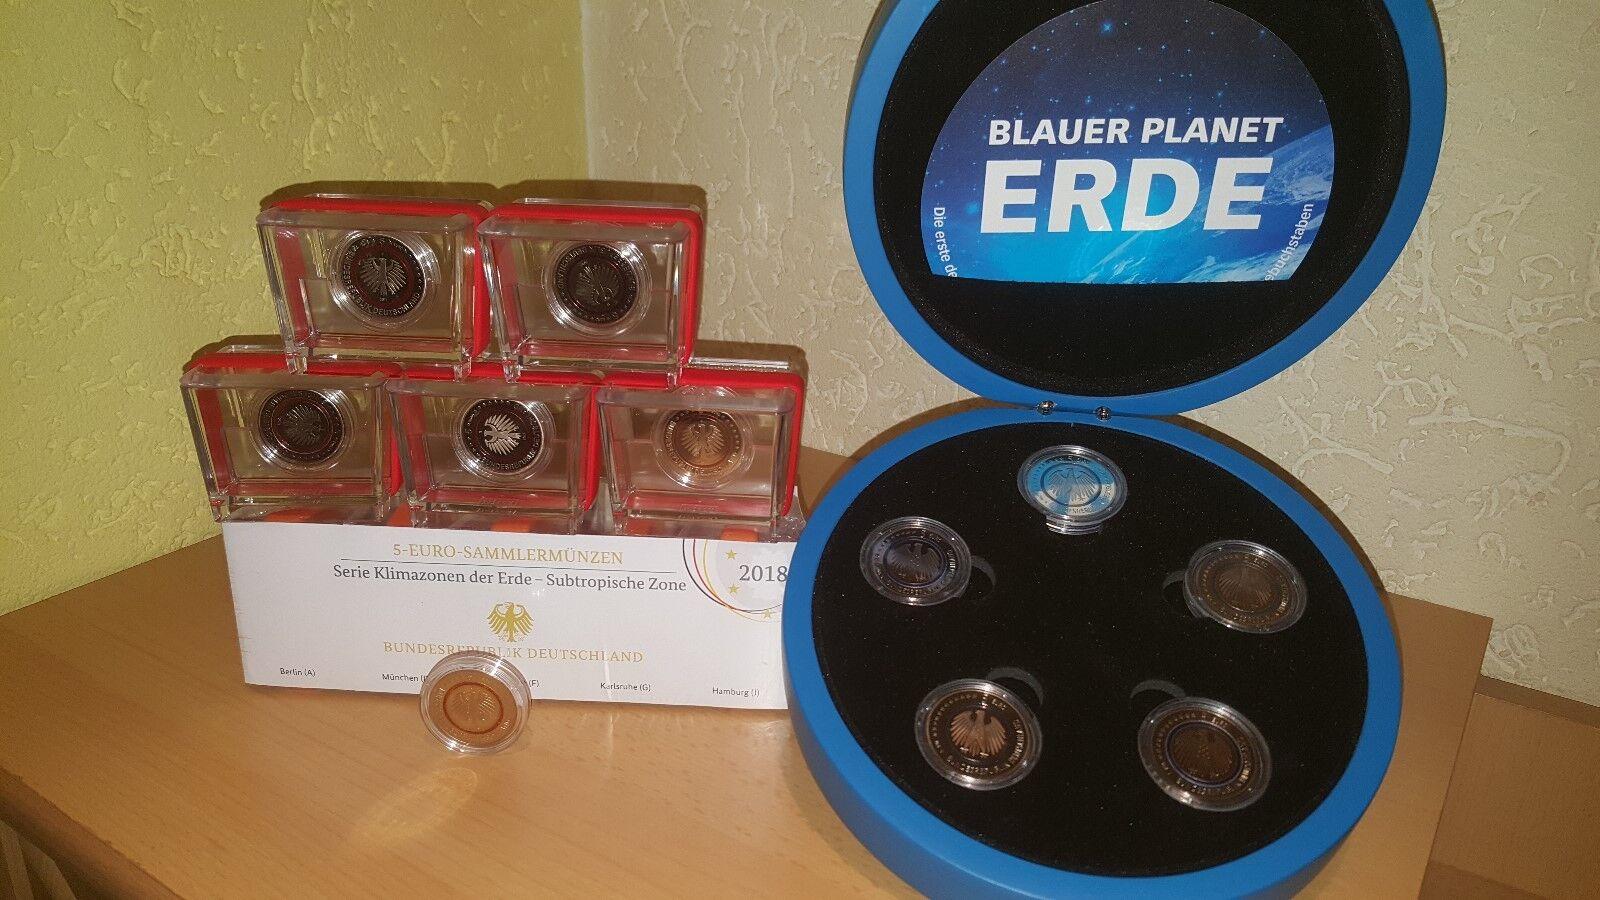 5 X 5 Euro Planet Erde 2016 In Pp Komplett Adfgj